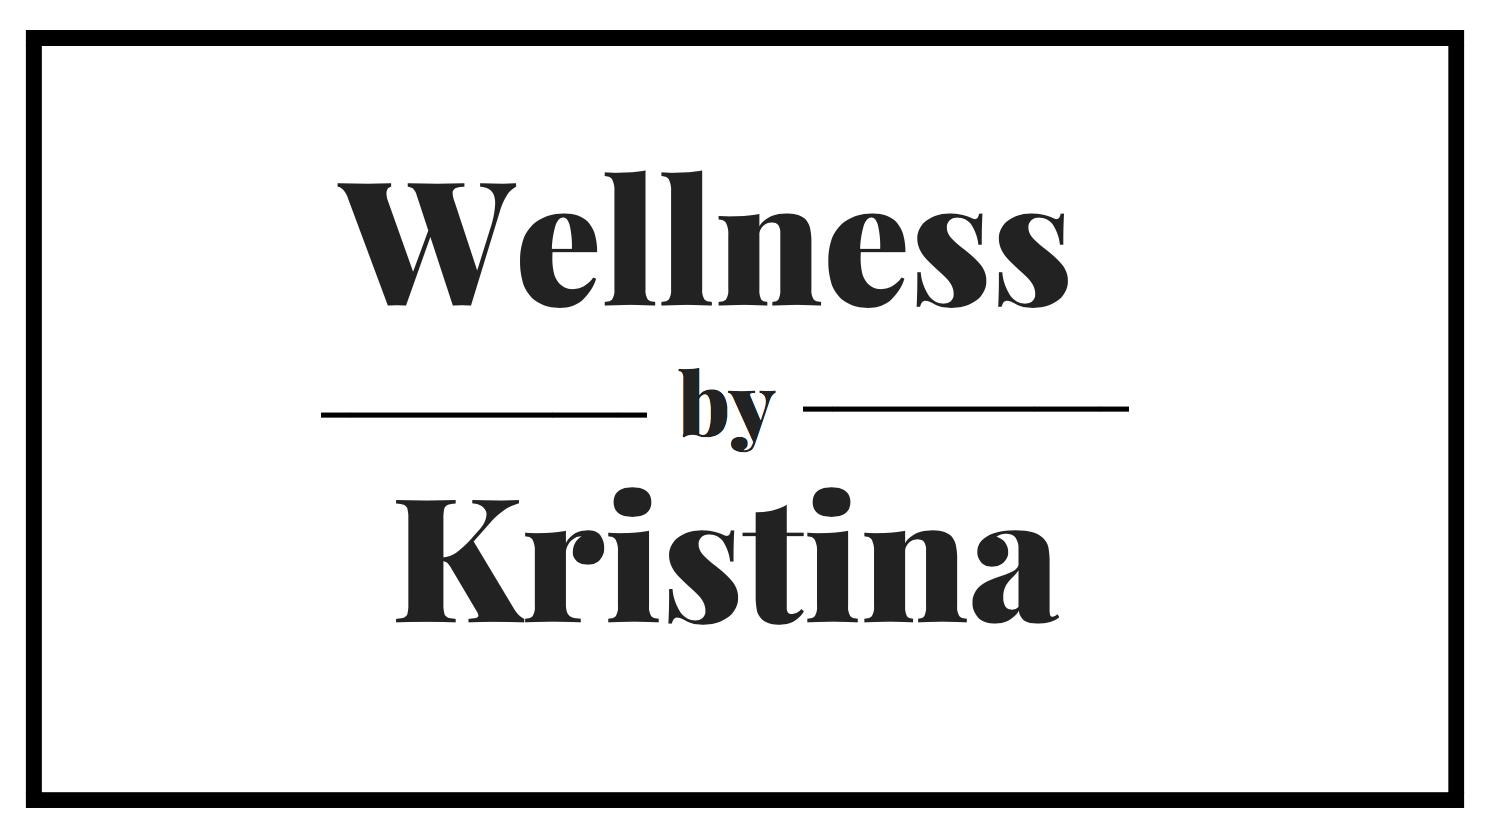 Wellness by Kristina